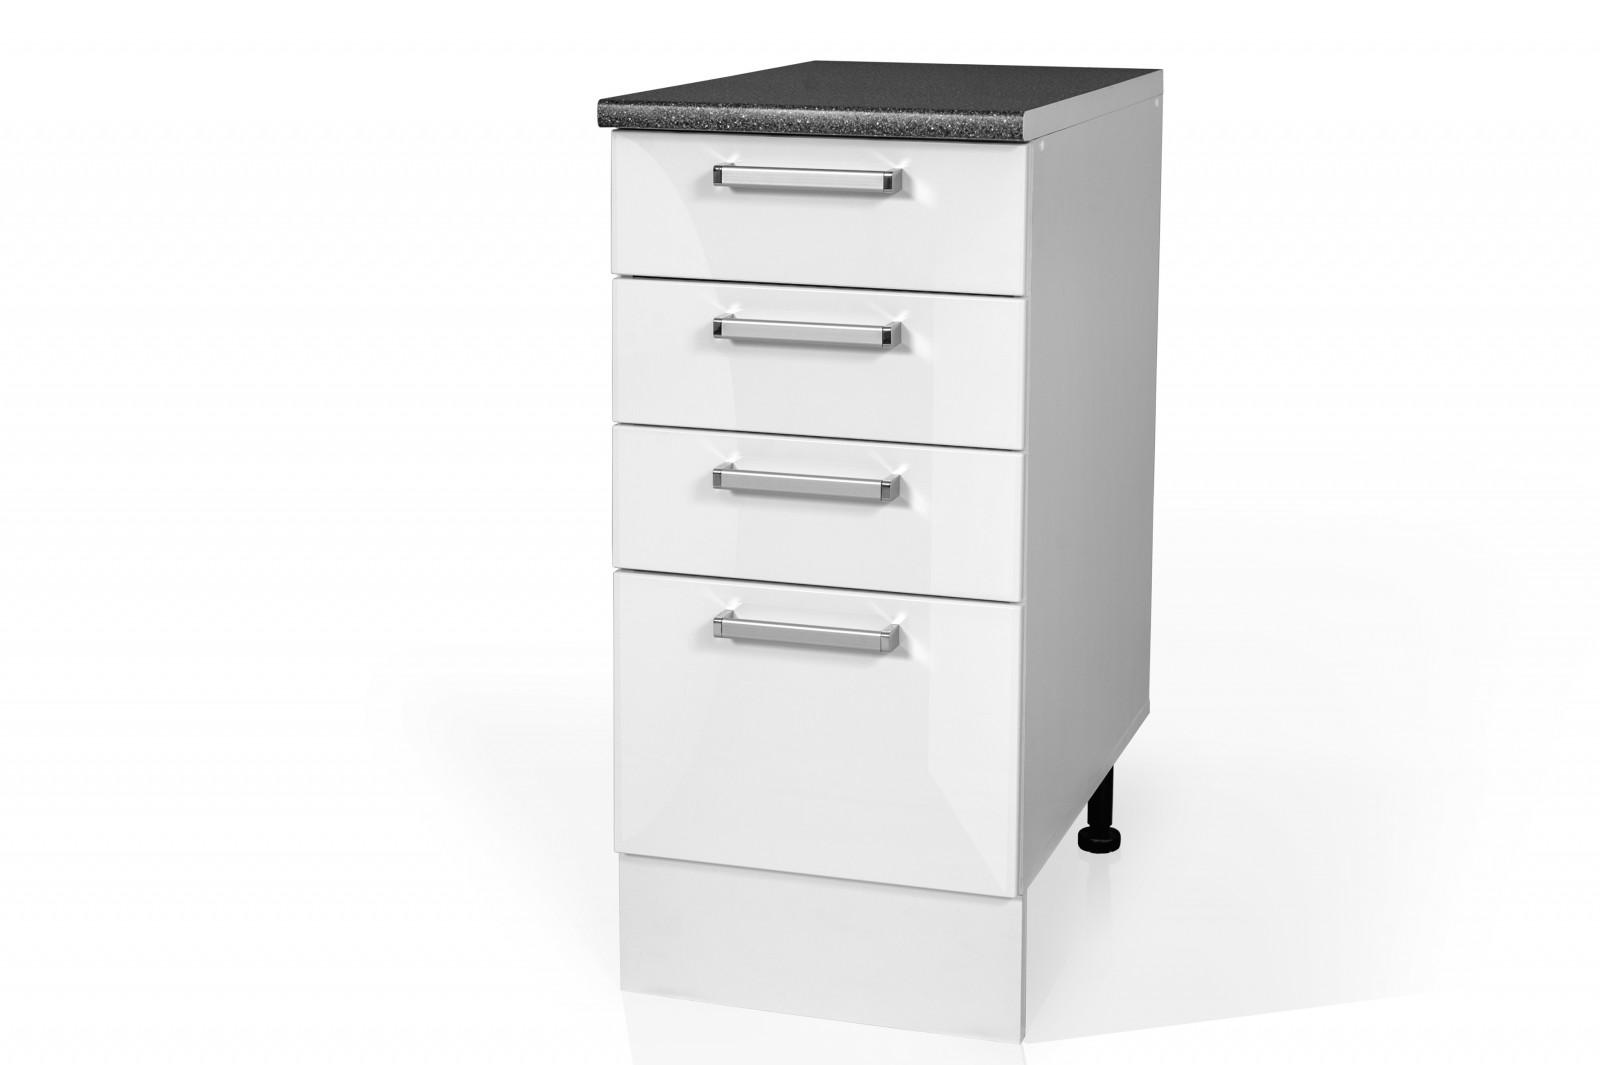 High Gloss White Base drawer cabinet for kitchen